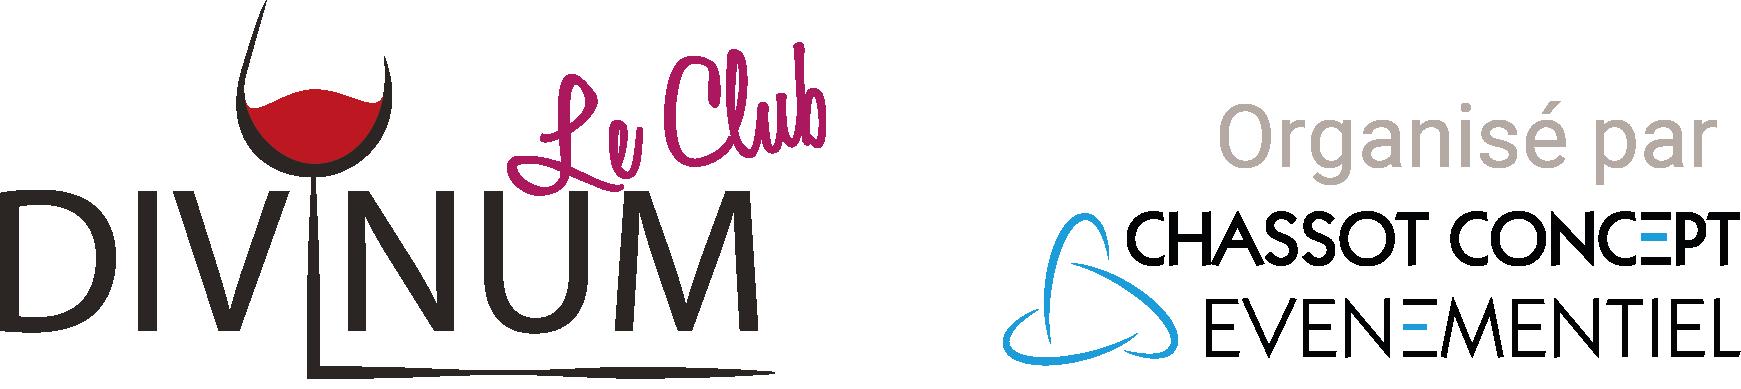 logo_divinum-club+chassot-2018-01